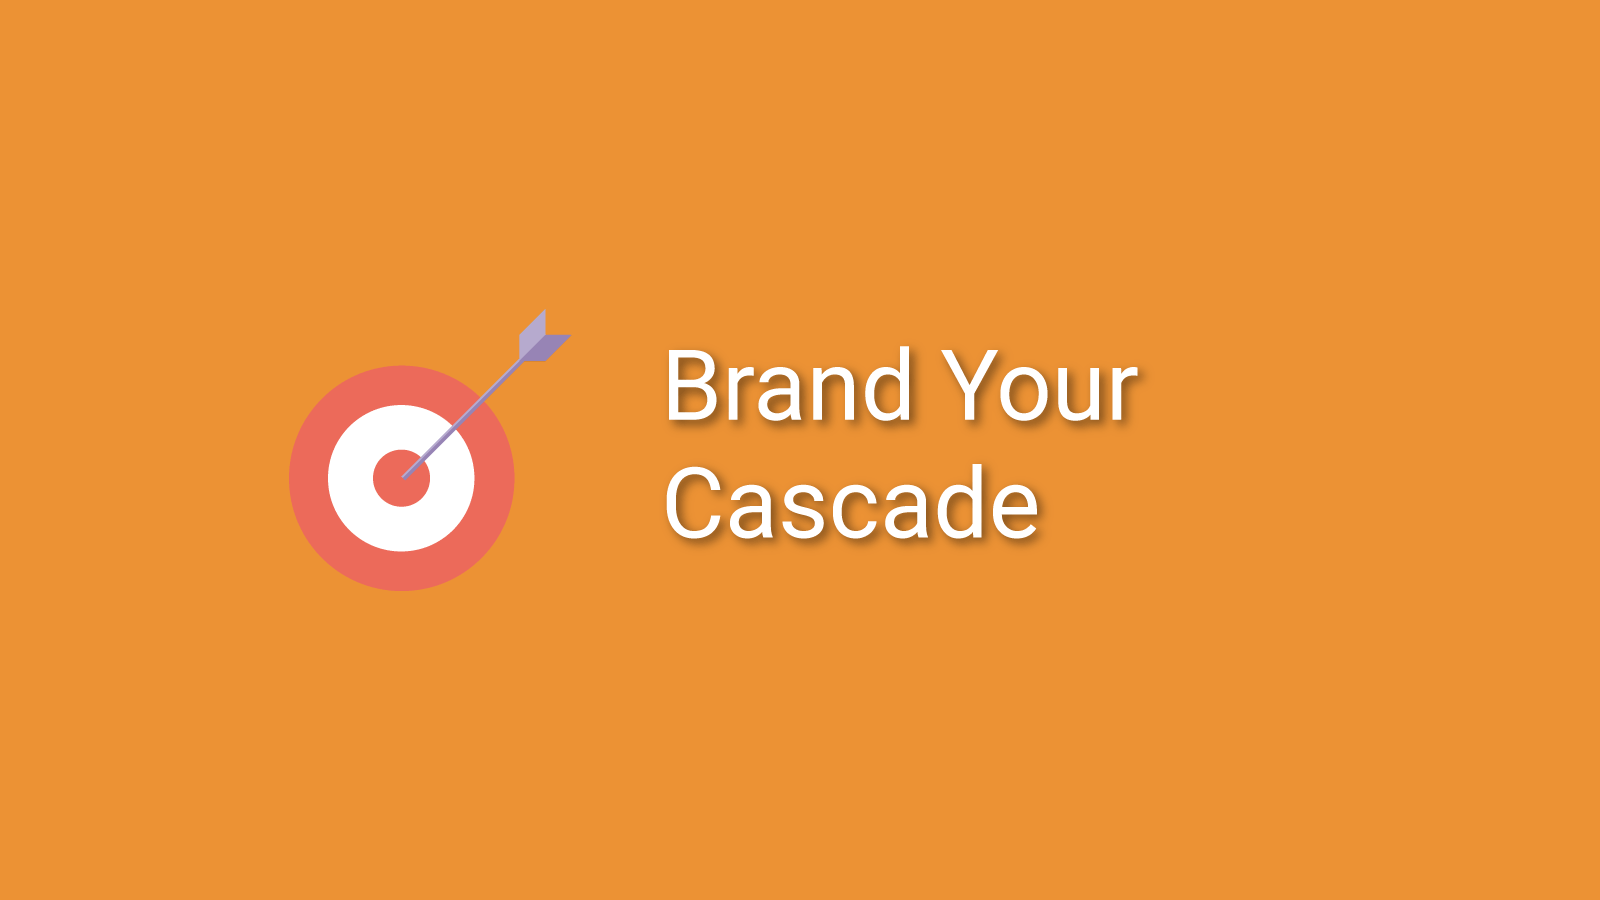 Brand Your Cascade Course